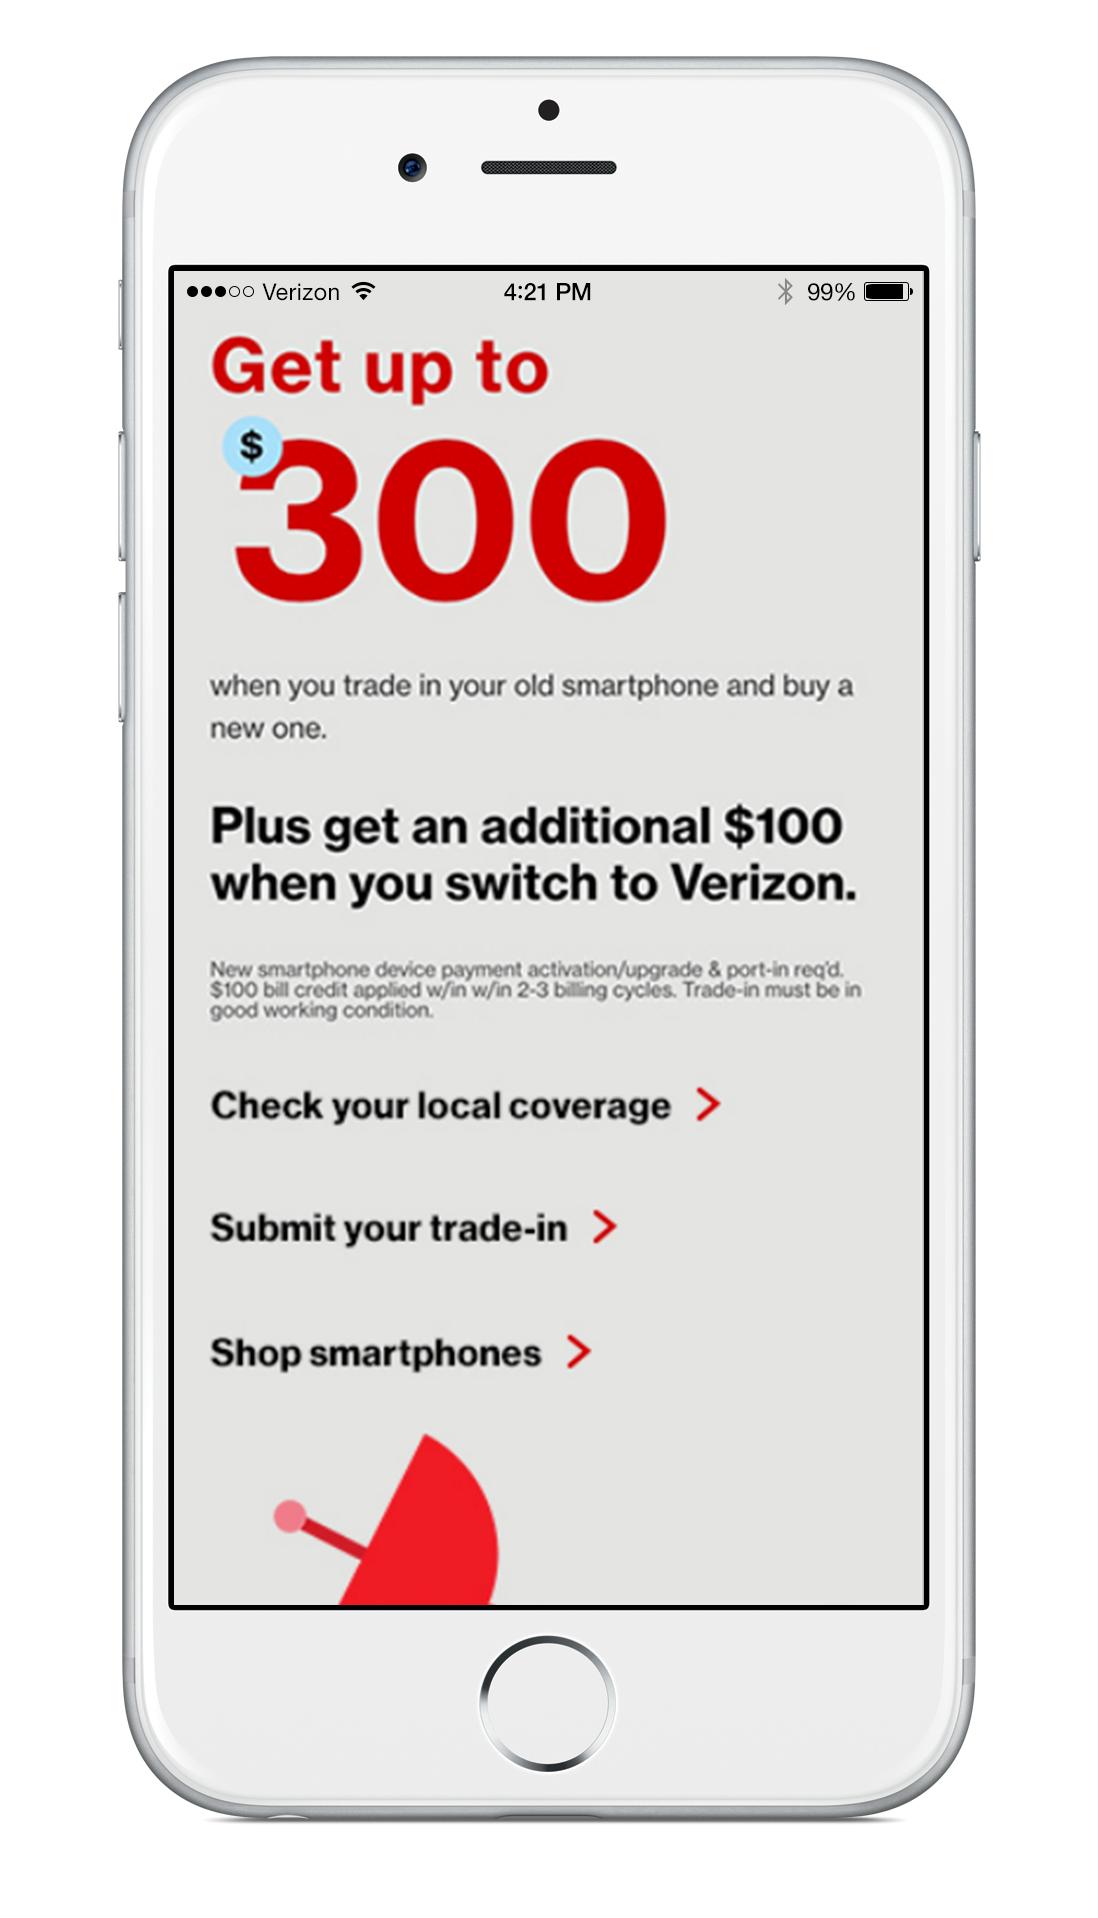 Verizon_Comps_indevice_tmo1.jpg